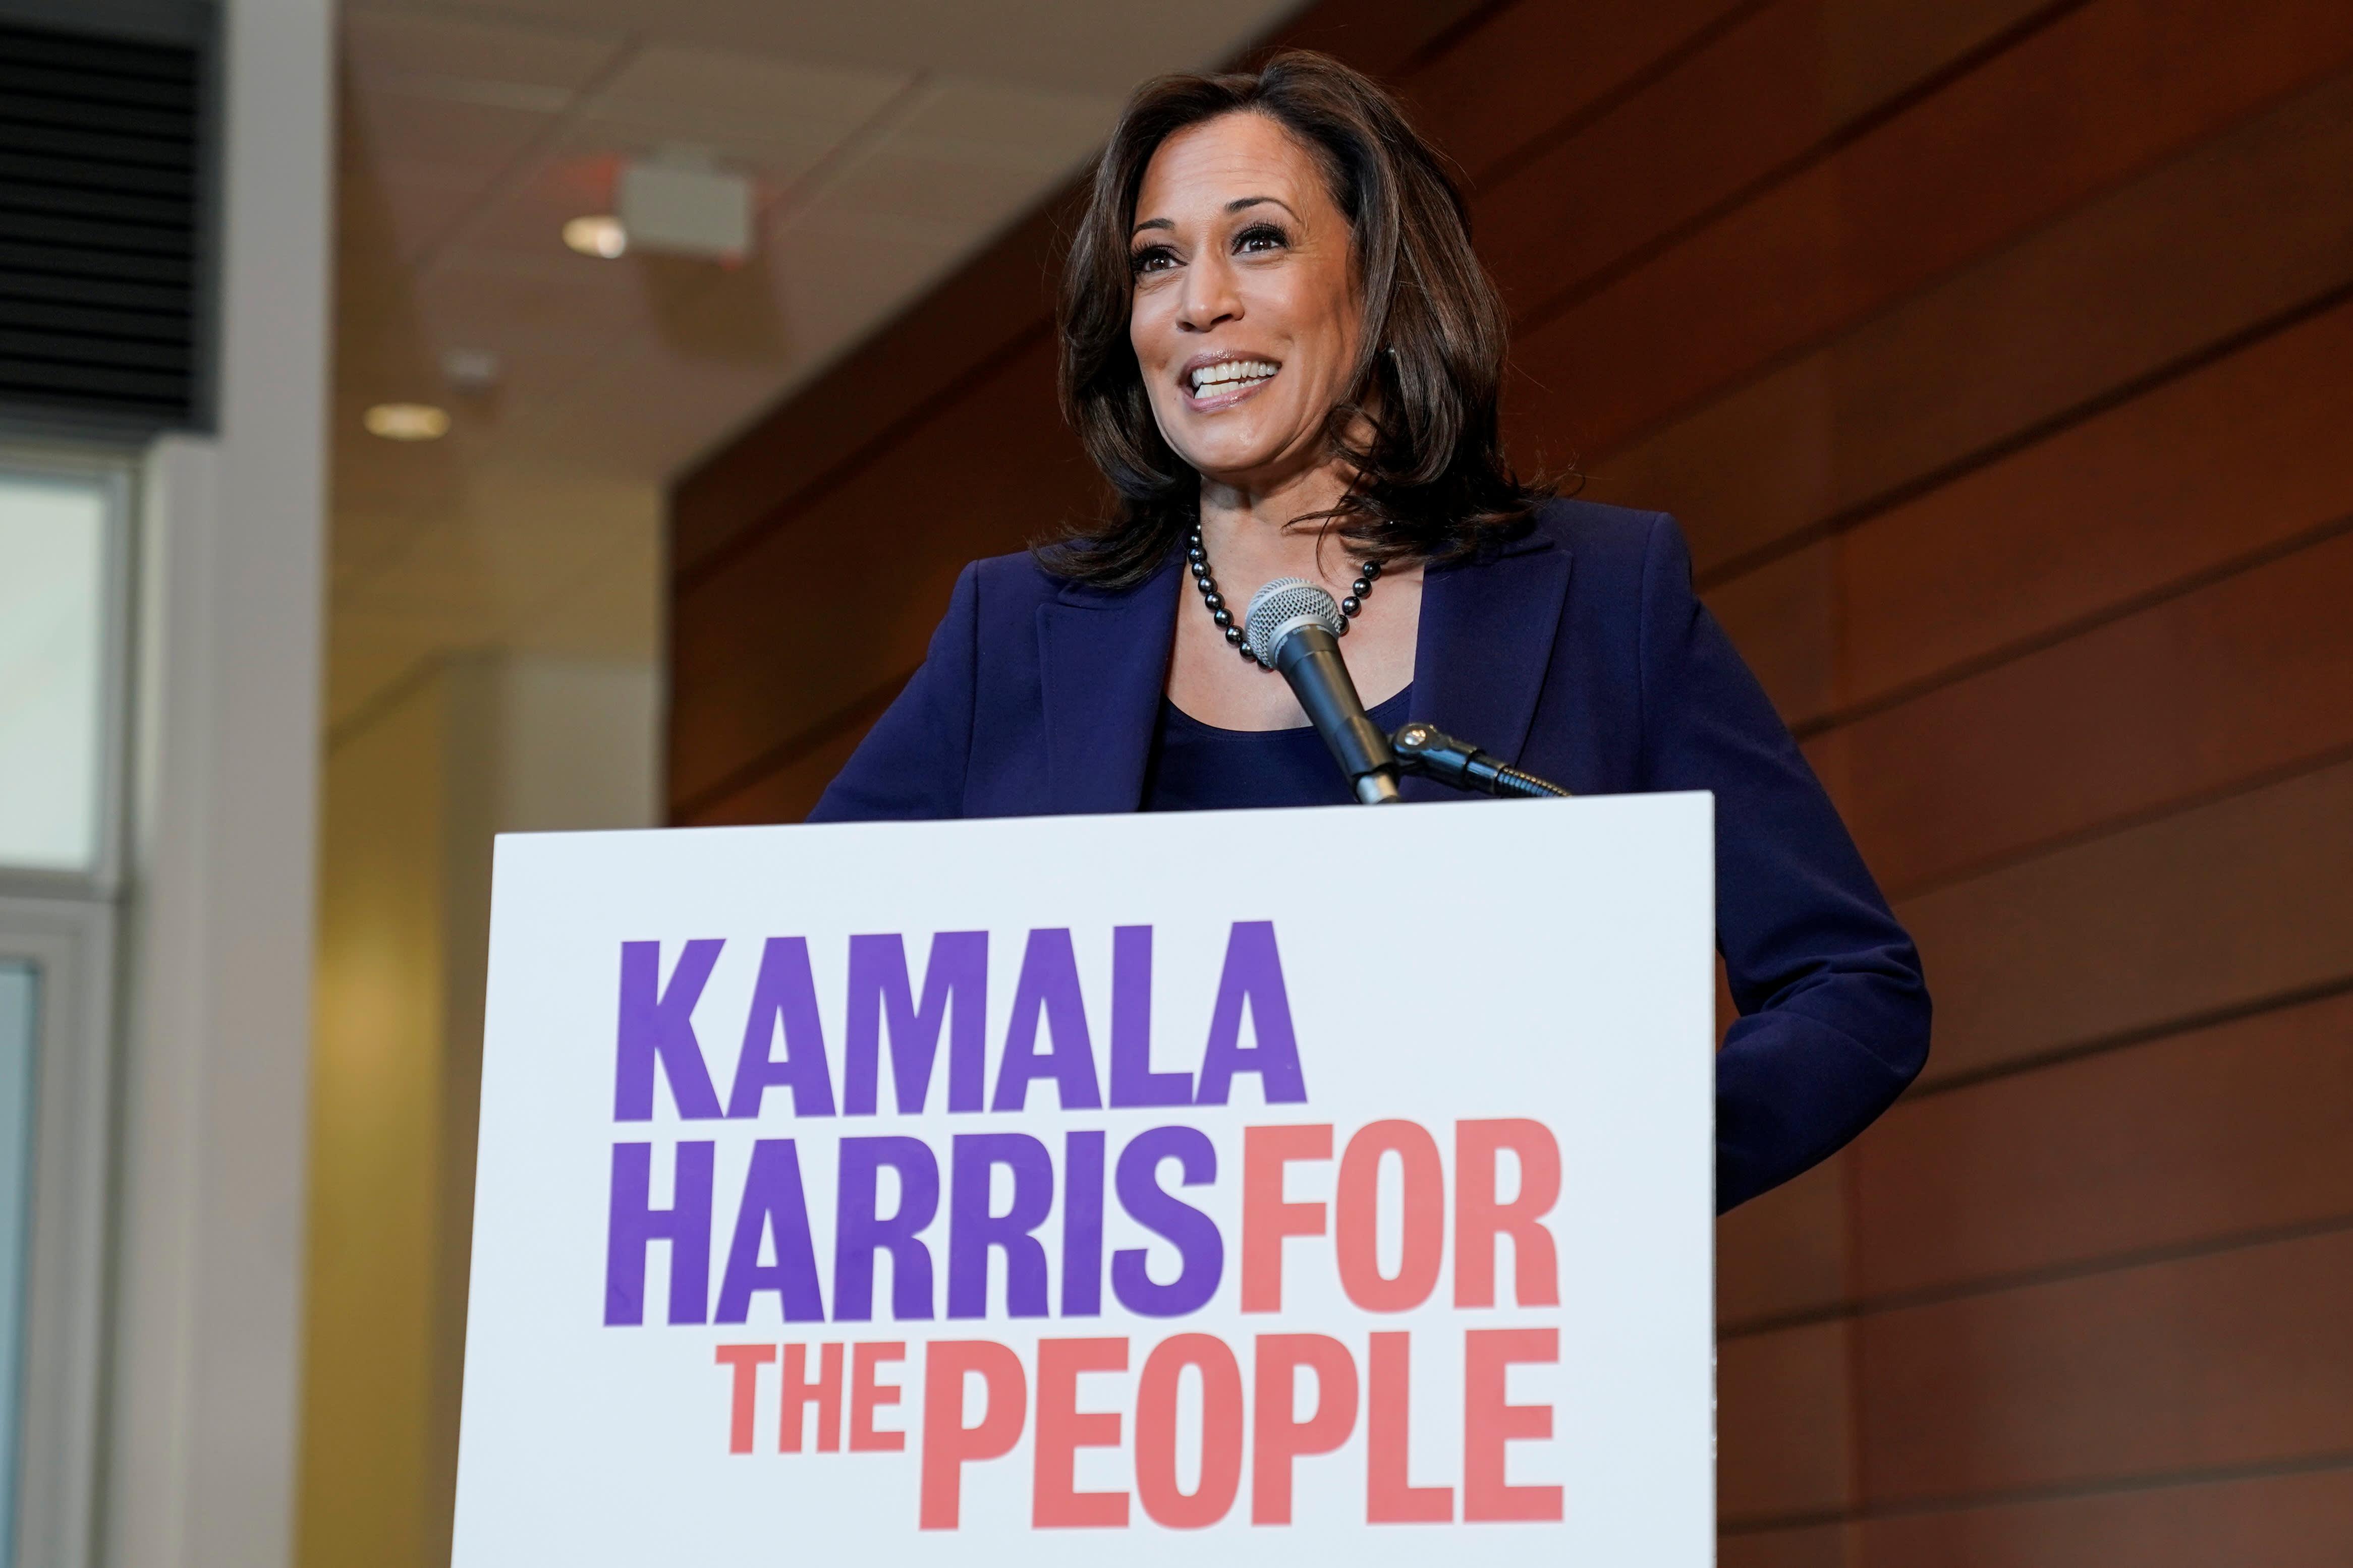 Democratic US Senator Kamala Harris jumps into 2020 White House race